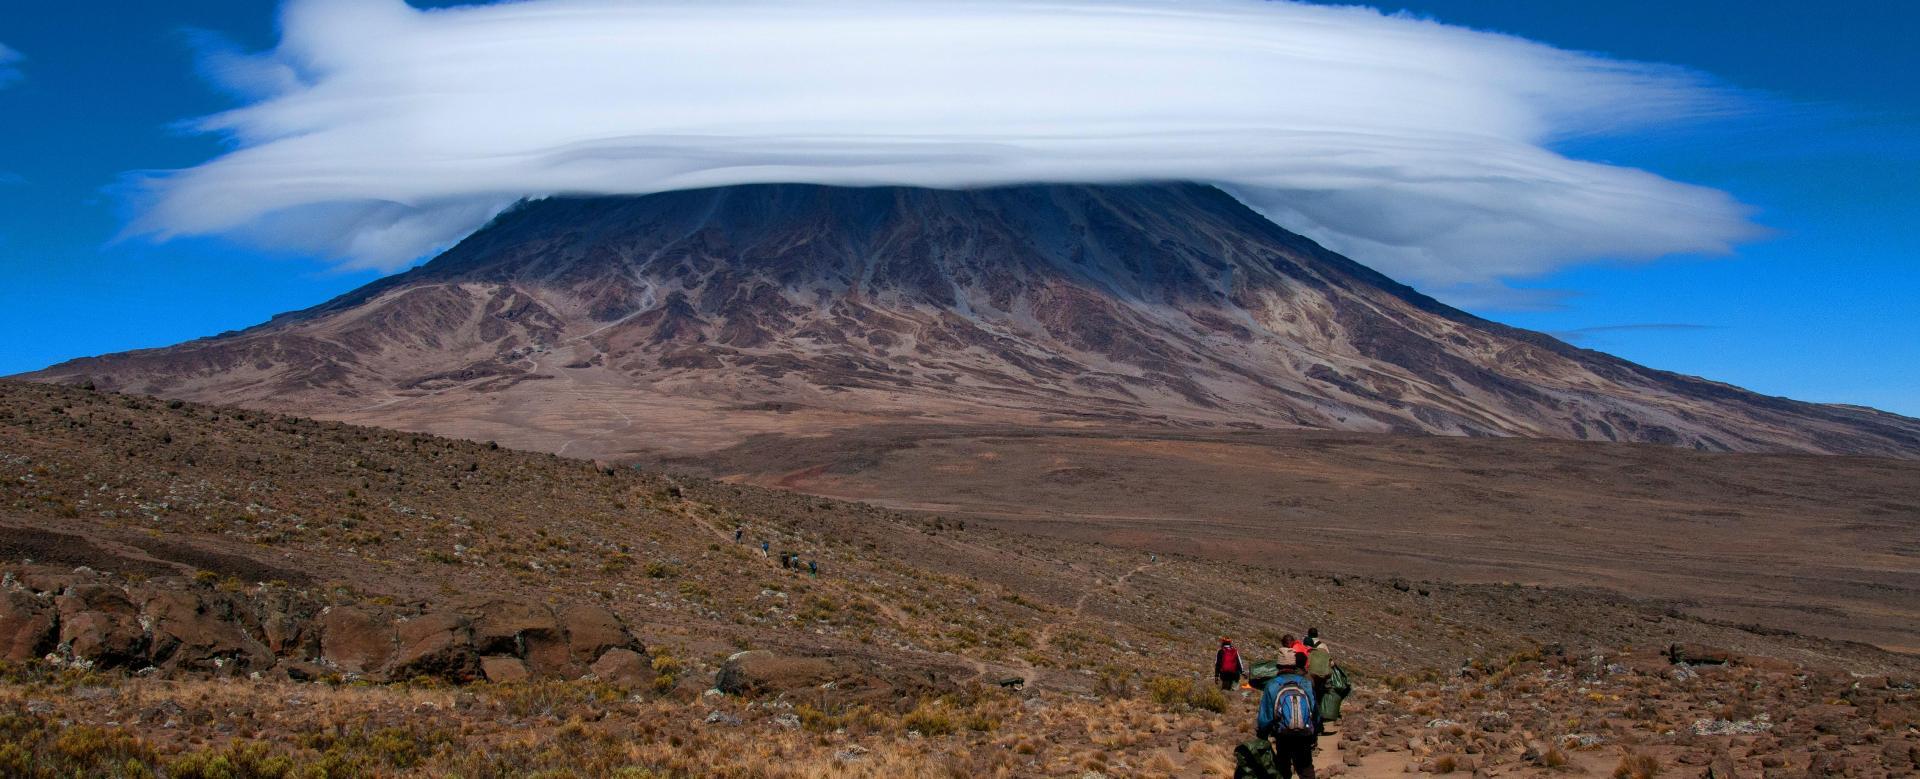 Voyage à pied : Mont kenya et kilimandjaro